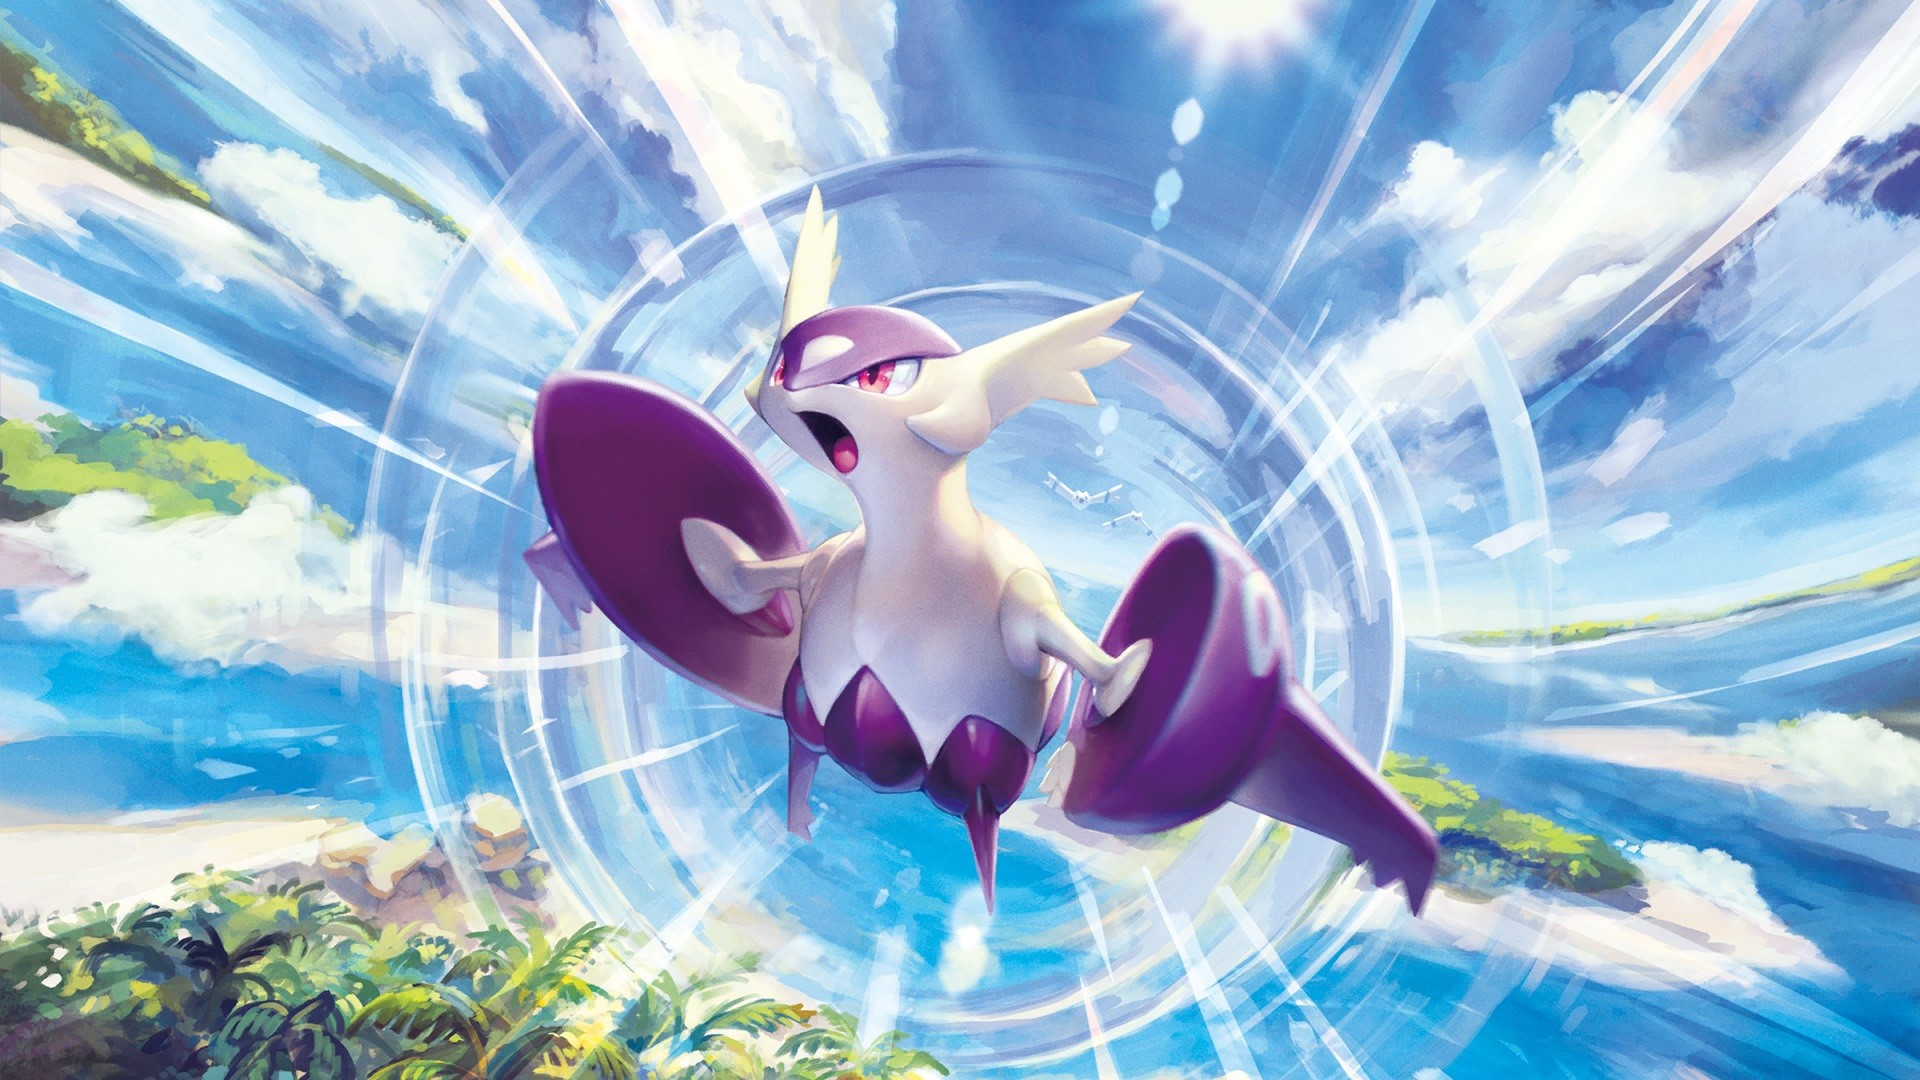 Image РMega Latias Pokemon TCG XY Roaring Skies.jpg   Pok̩mon Wiki    FANDOM powered by Wikia